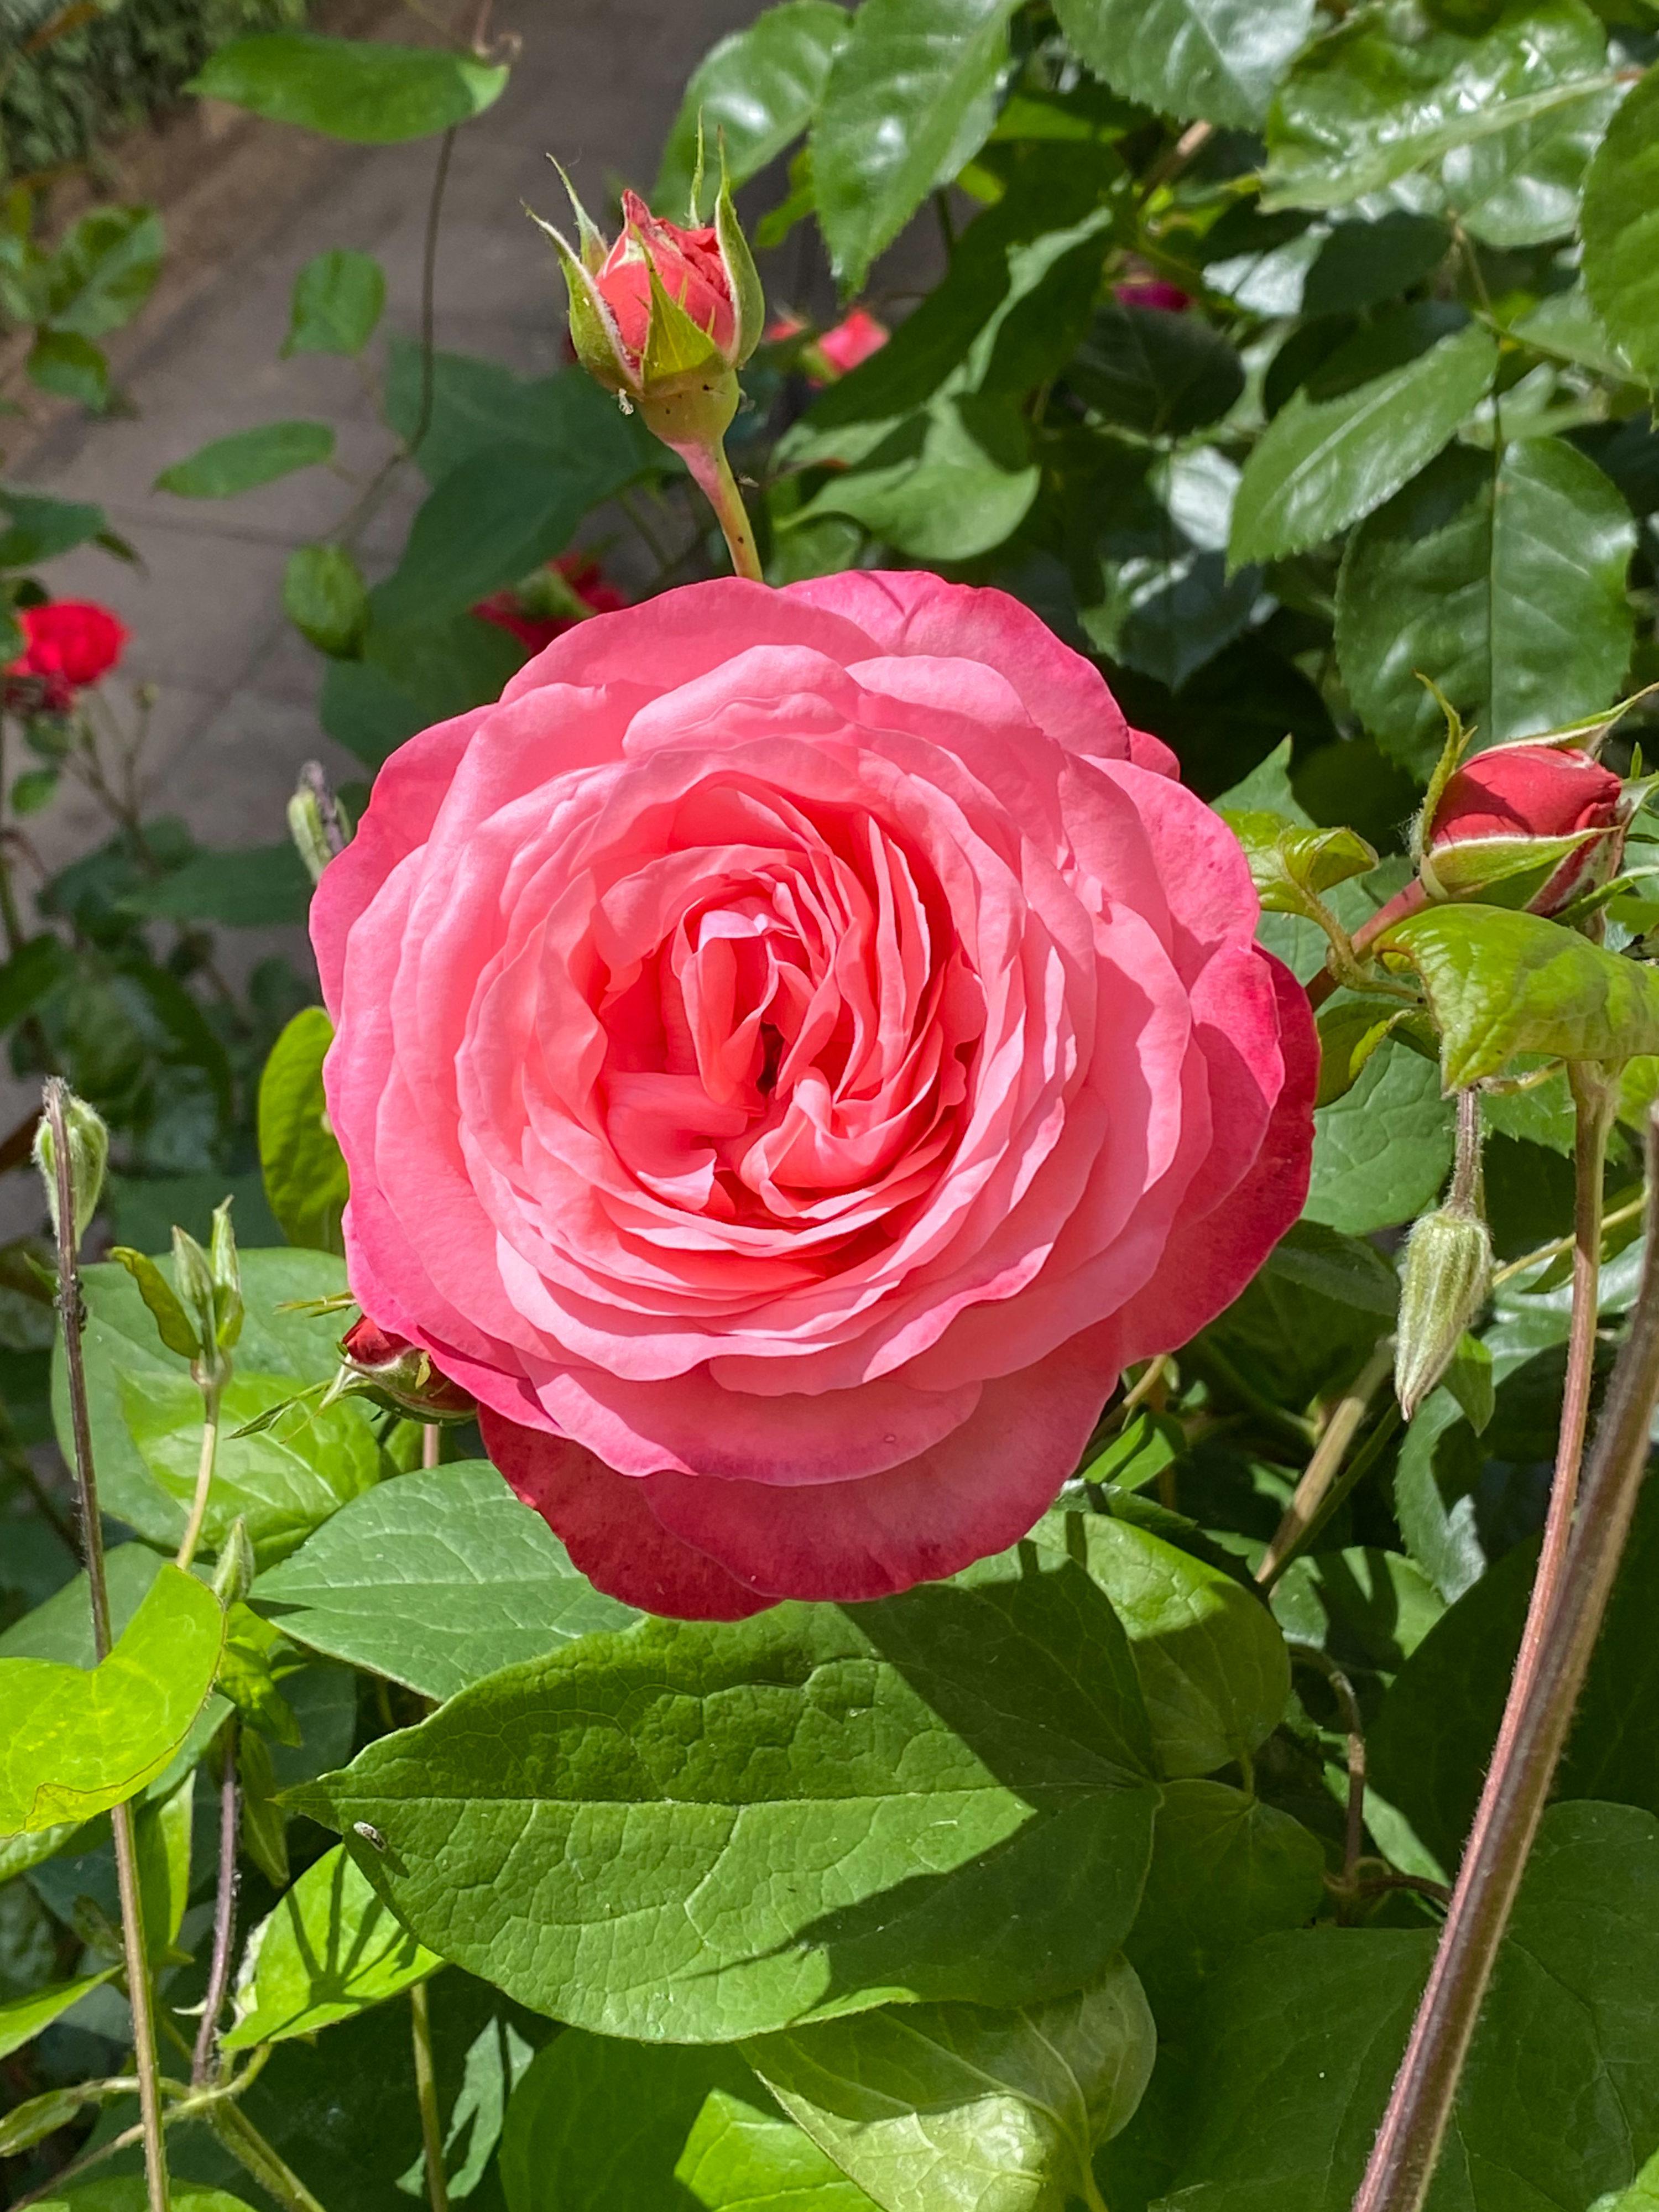 Pfingstgrüße und beste Wünsche letter rose Rosanna